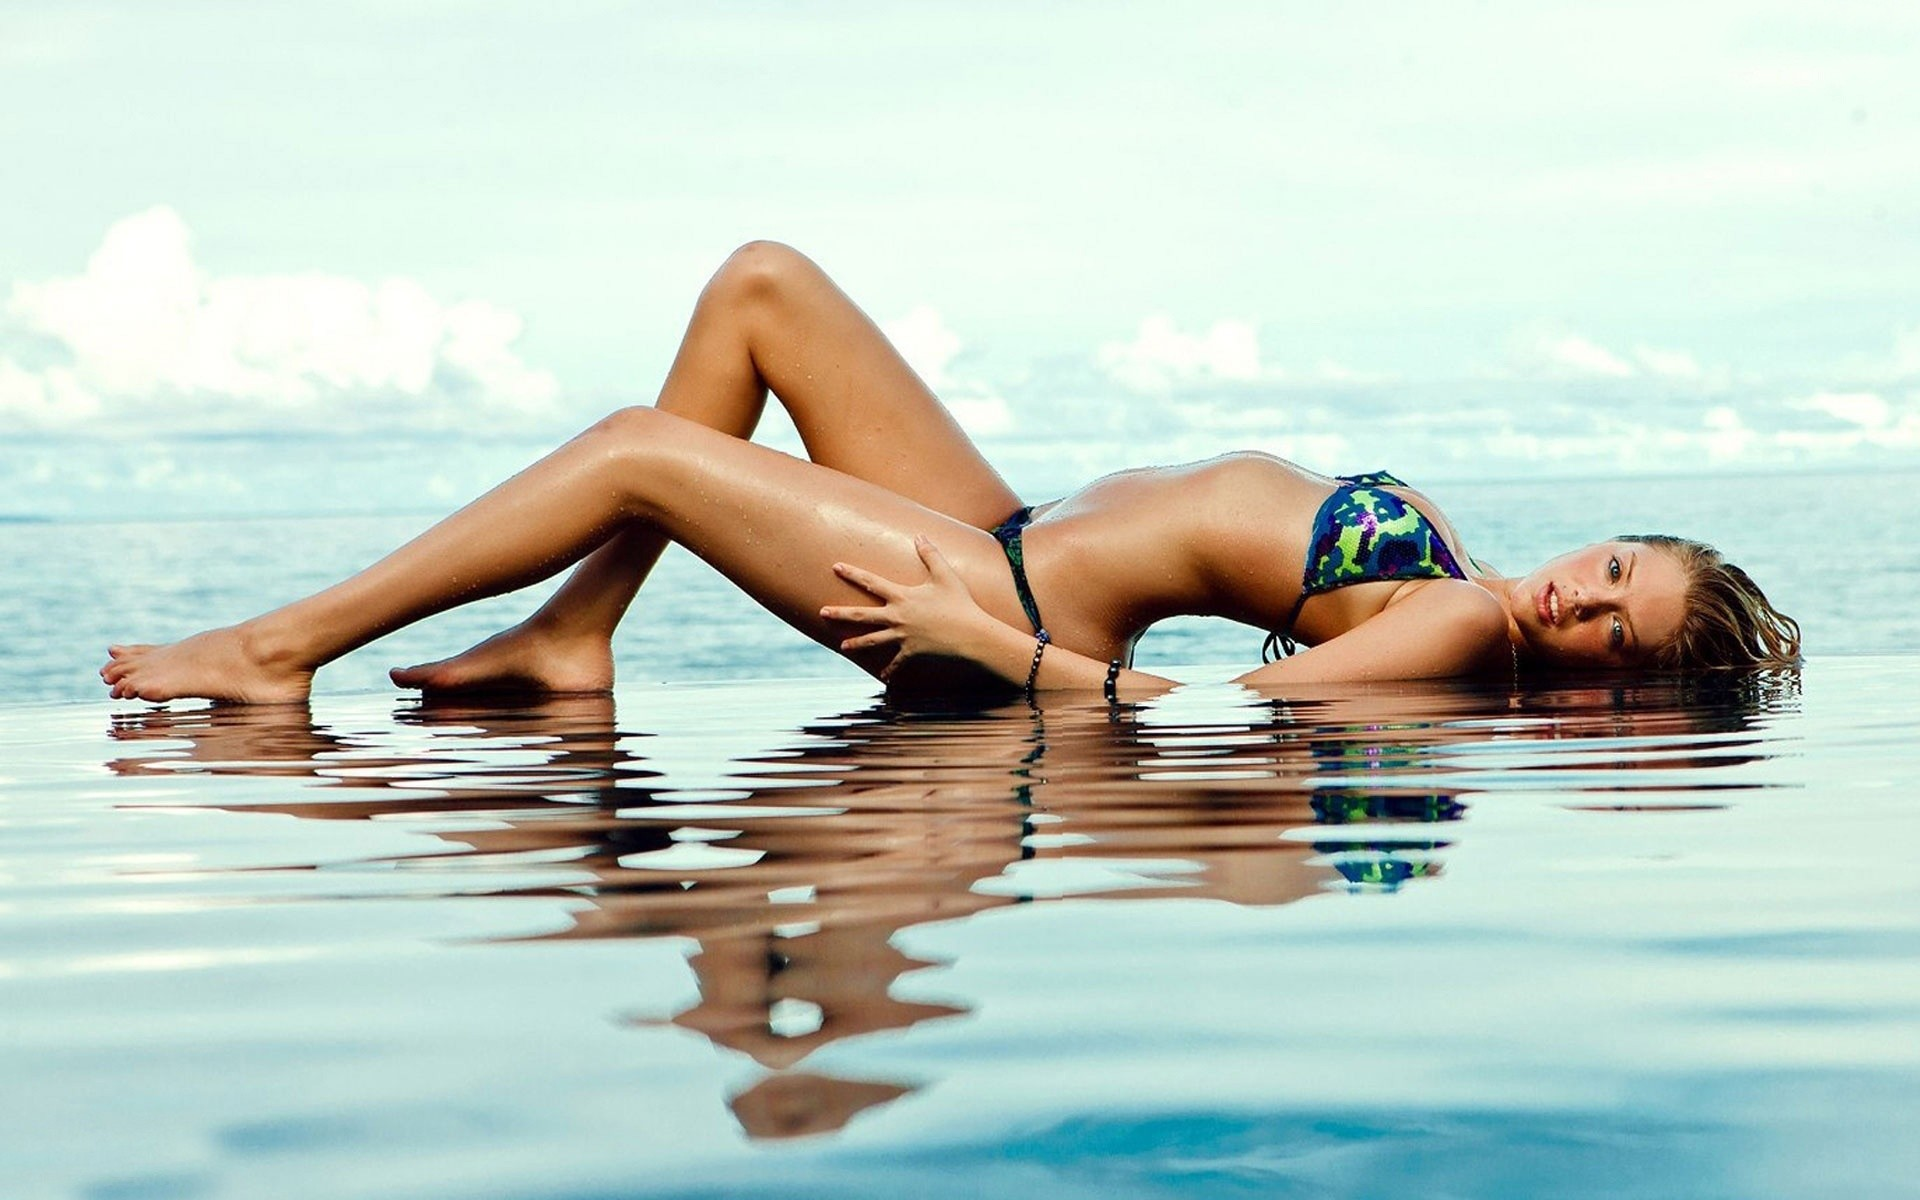 Kate Upton In Infinity Pool